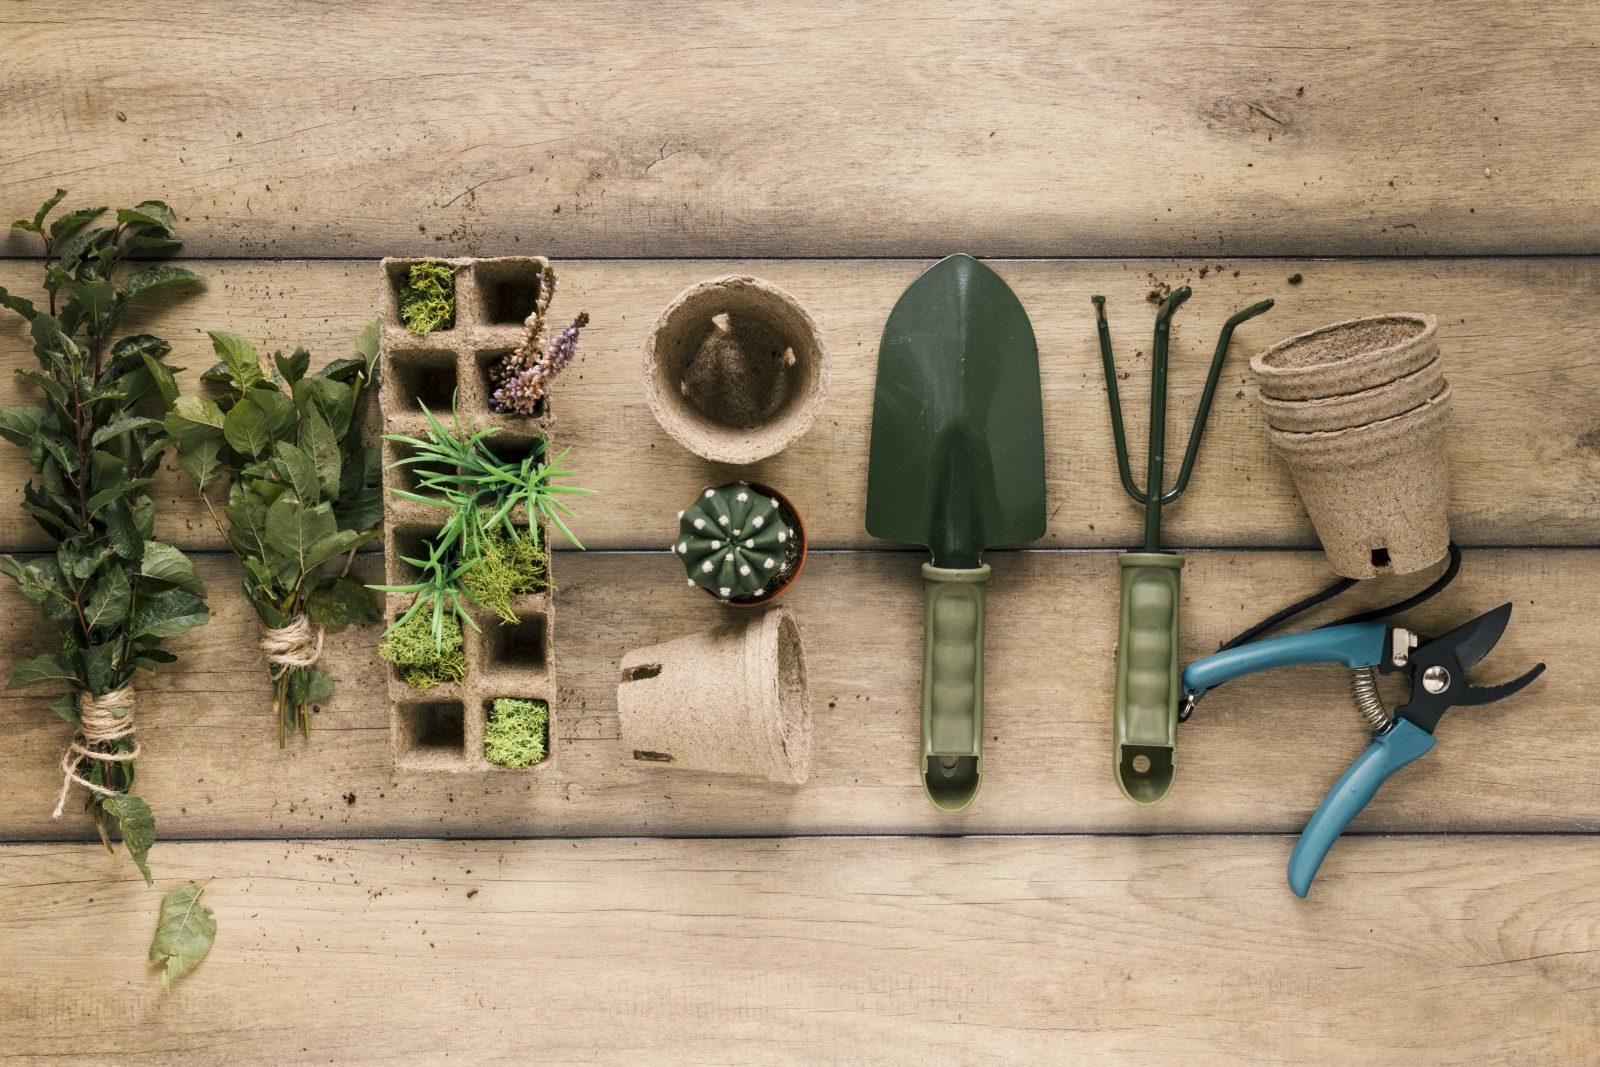 Variety of gardening tools